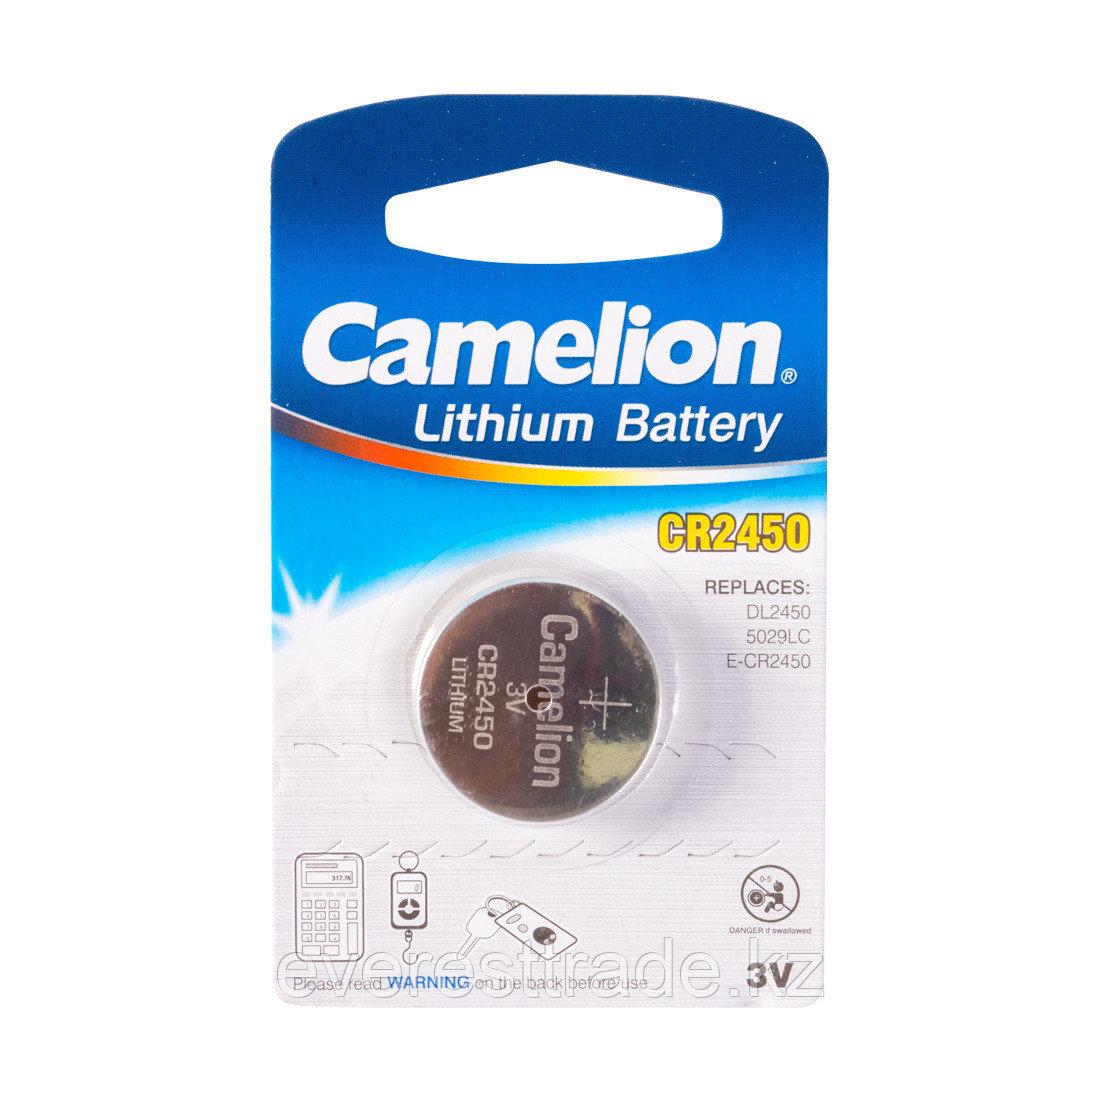 Camelion Батарейка, CAMELION, CR2450-BP1 Lithium Battery, CR2450, 3V, 220 mAh, 1 шт.